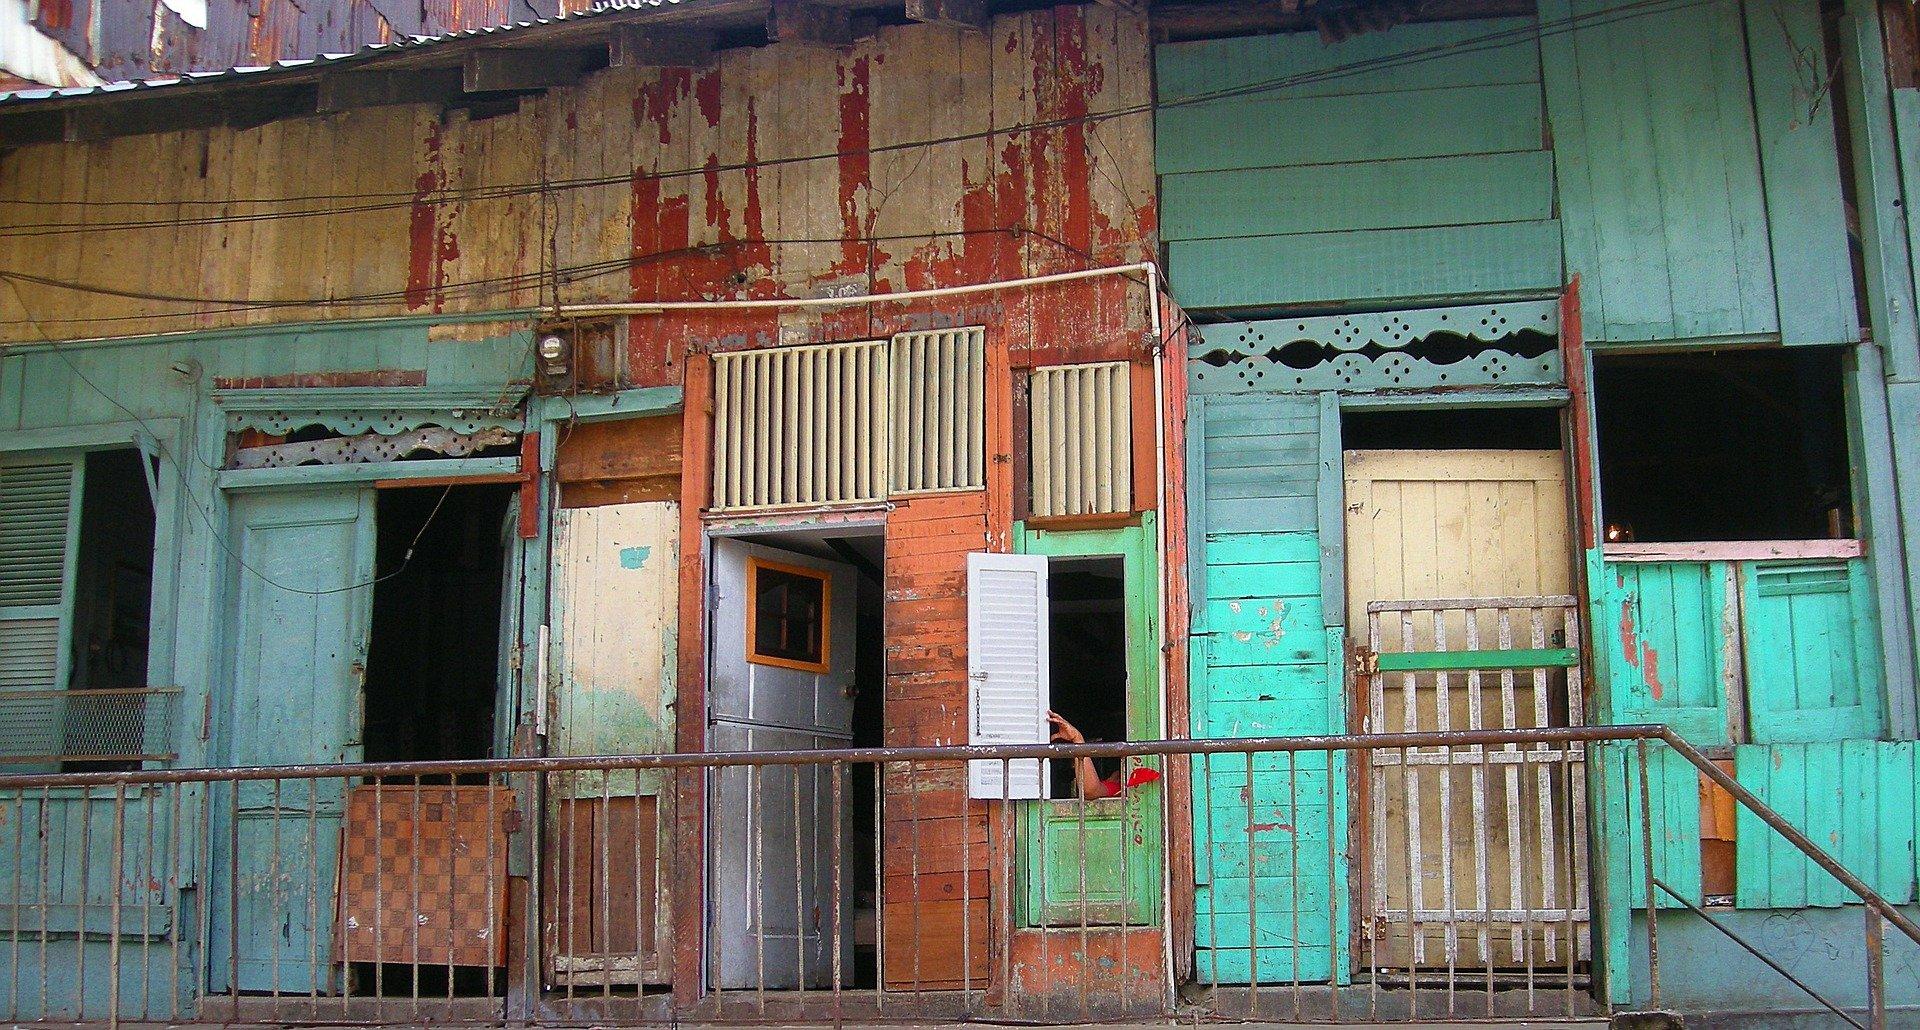 A slum scene for World Habitat Day